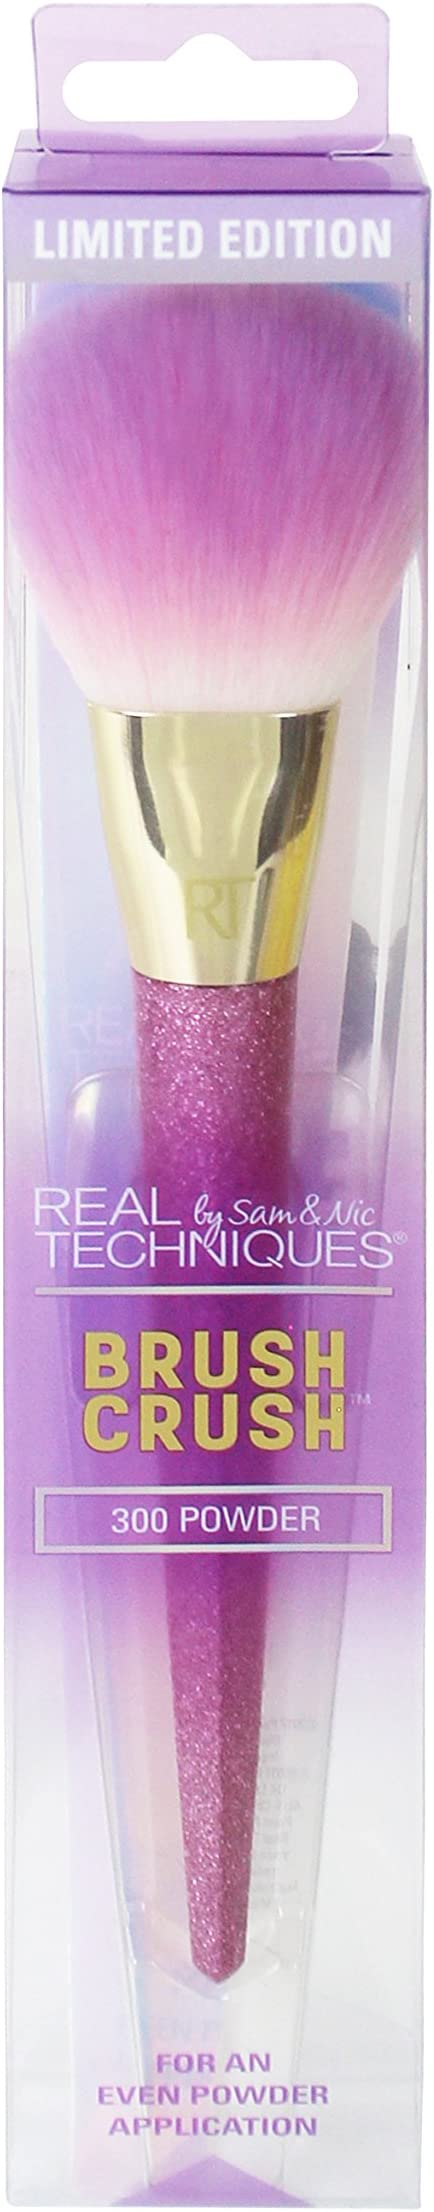 Real Techniques 300 Powder Brush Crush, Pack de 1: Amazon.es: Belleza